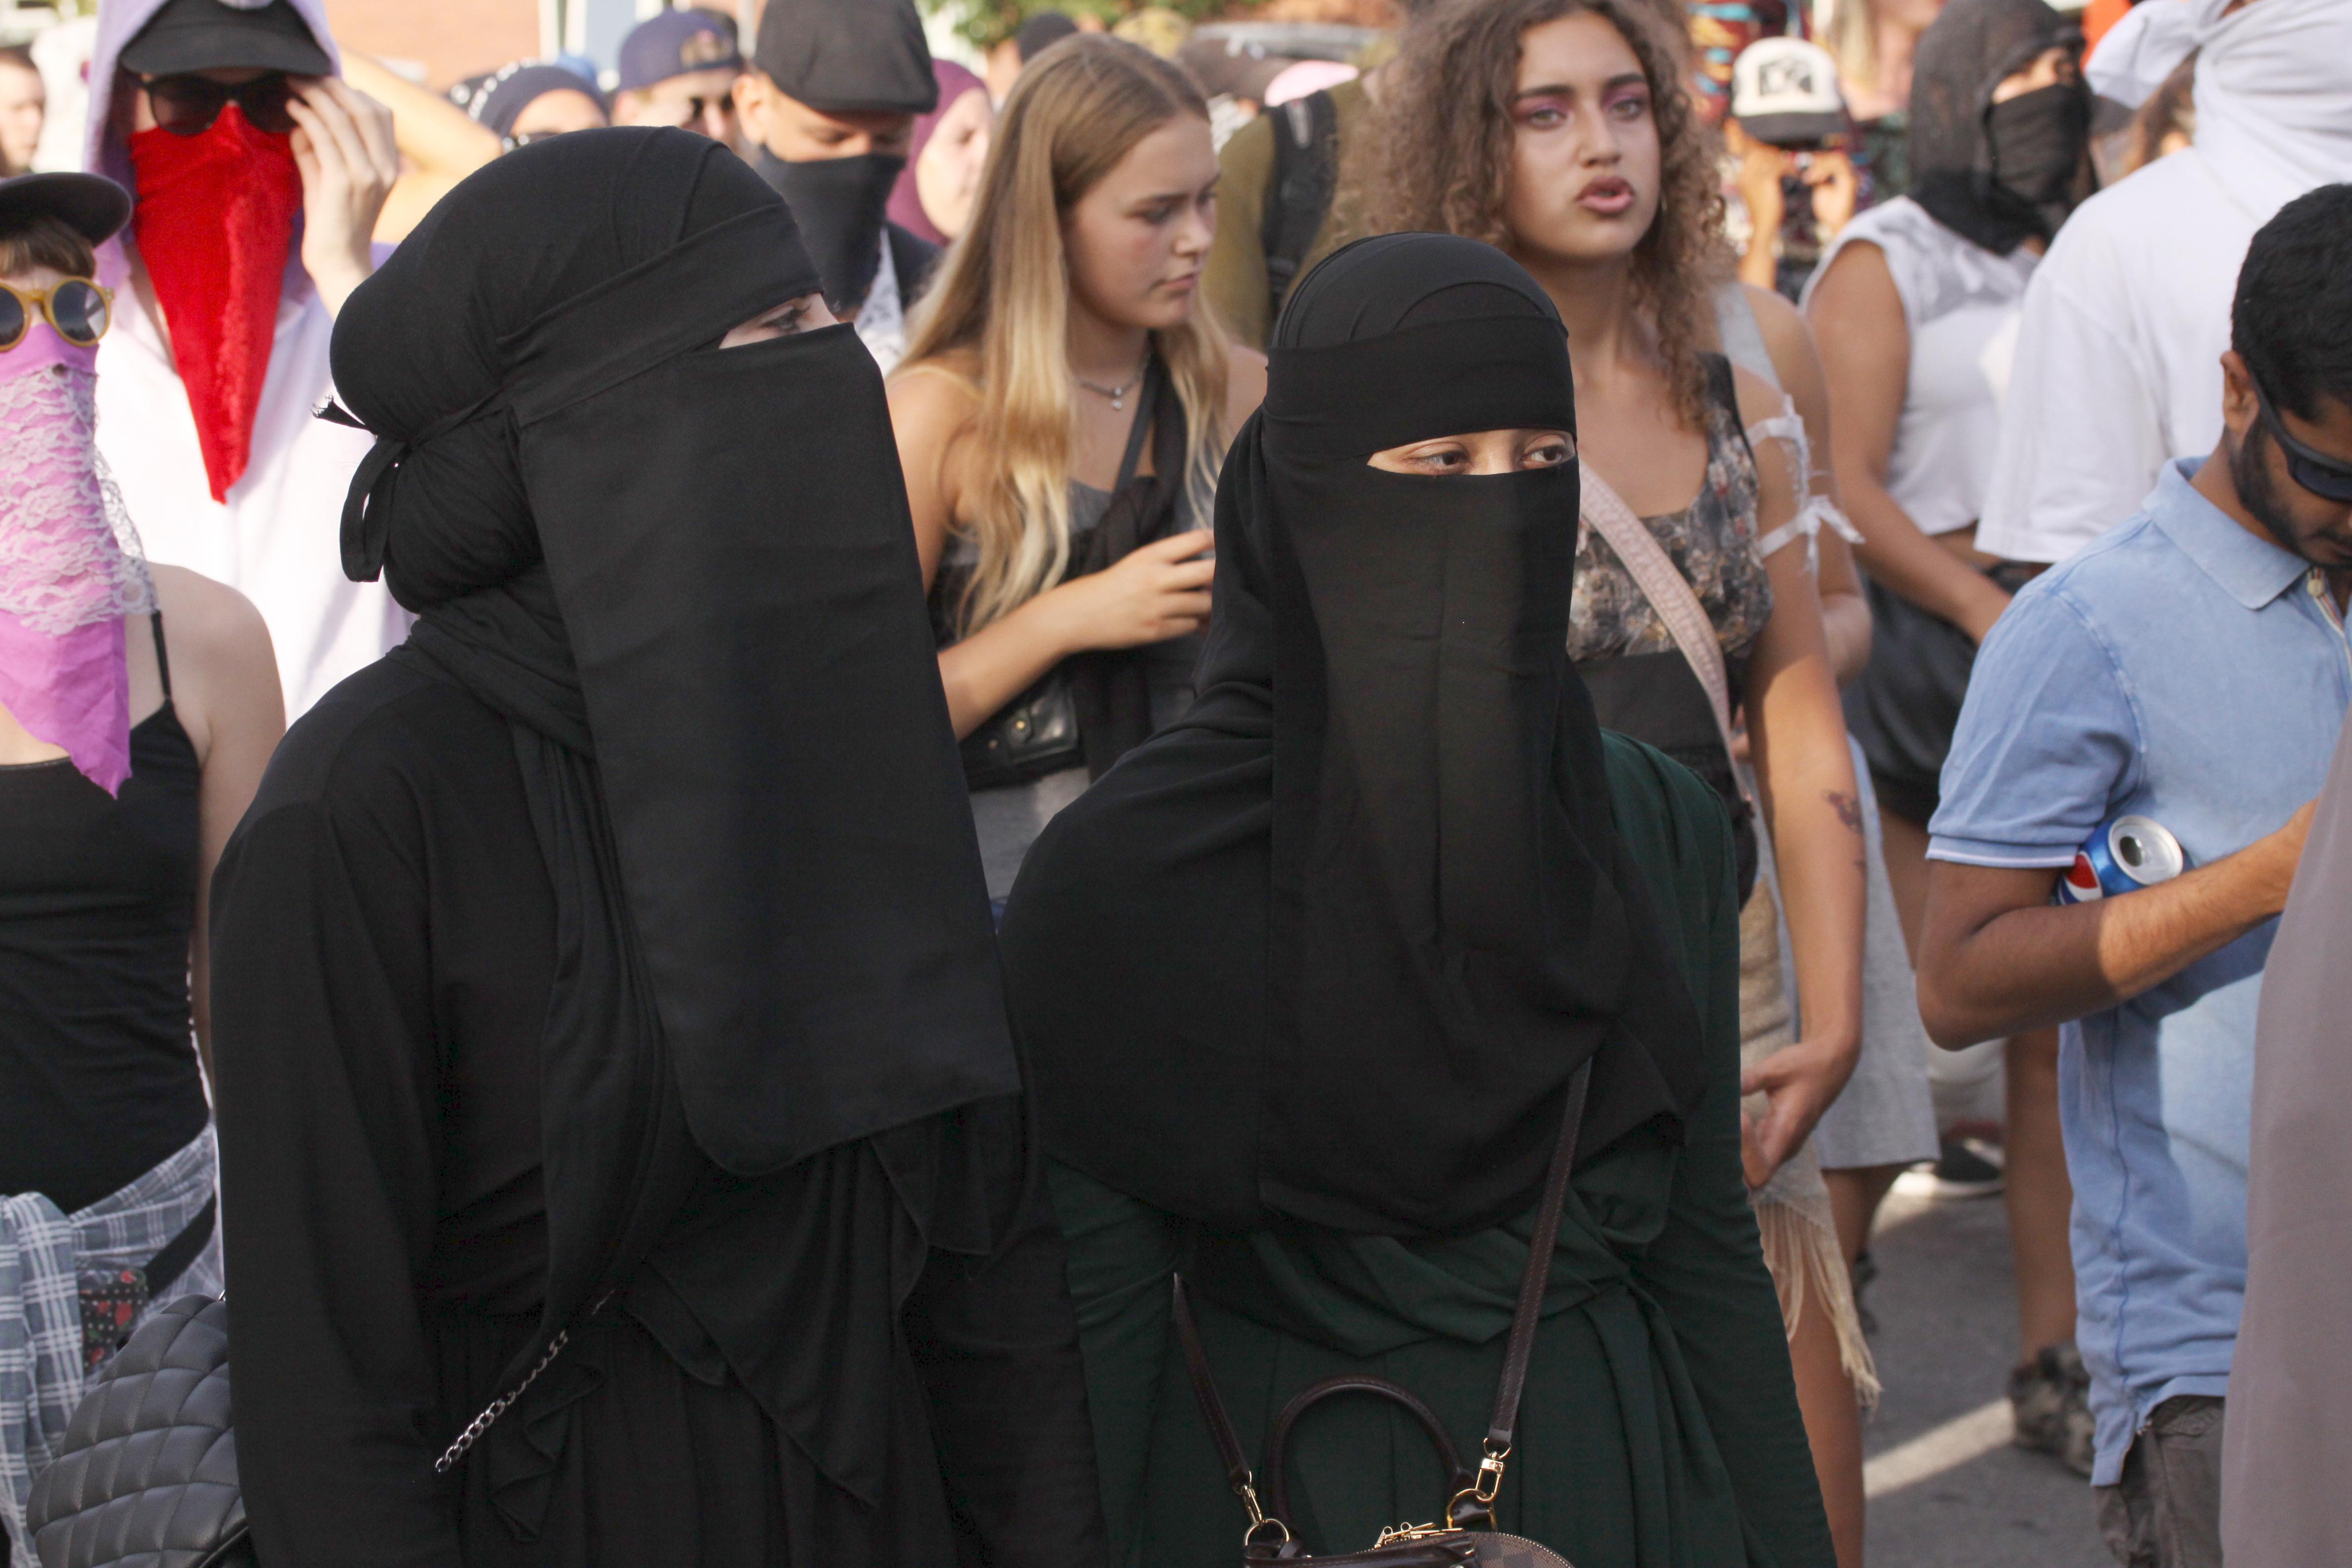 Burqa. Shutterstock